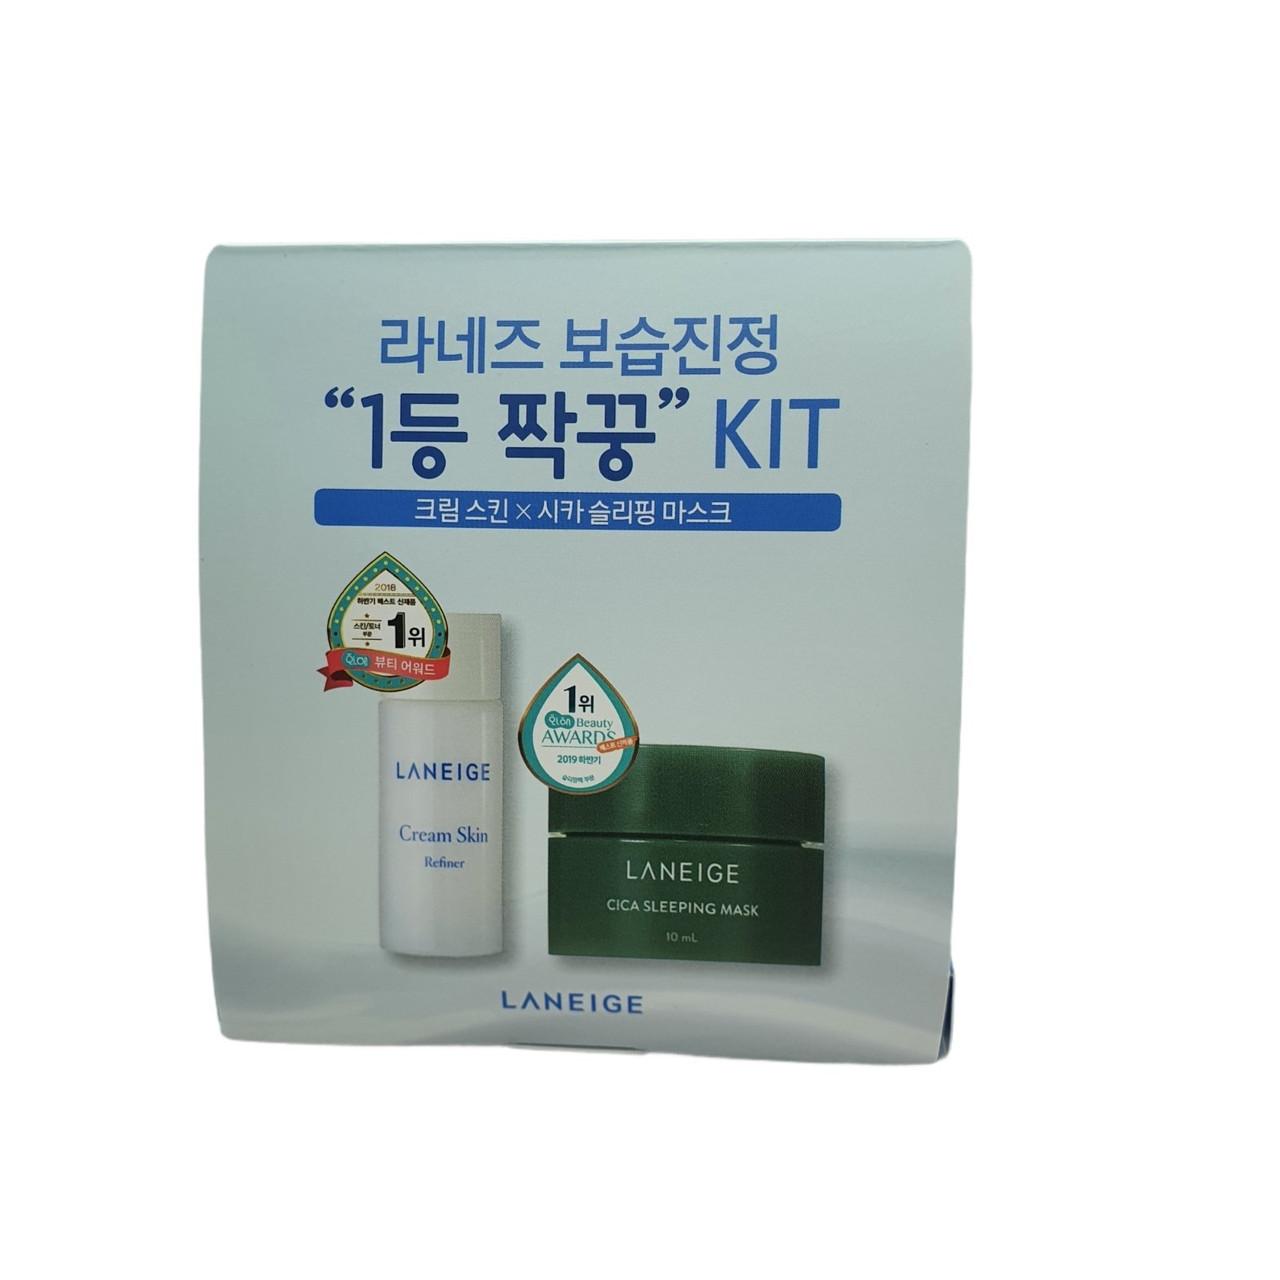 Laneige Care Skin Набор миниатюр (2 шт.)